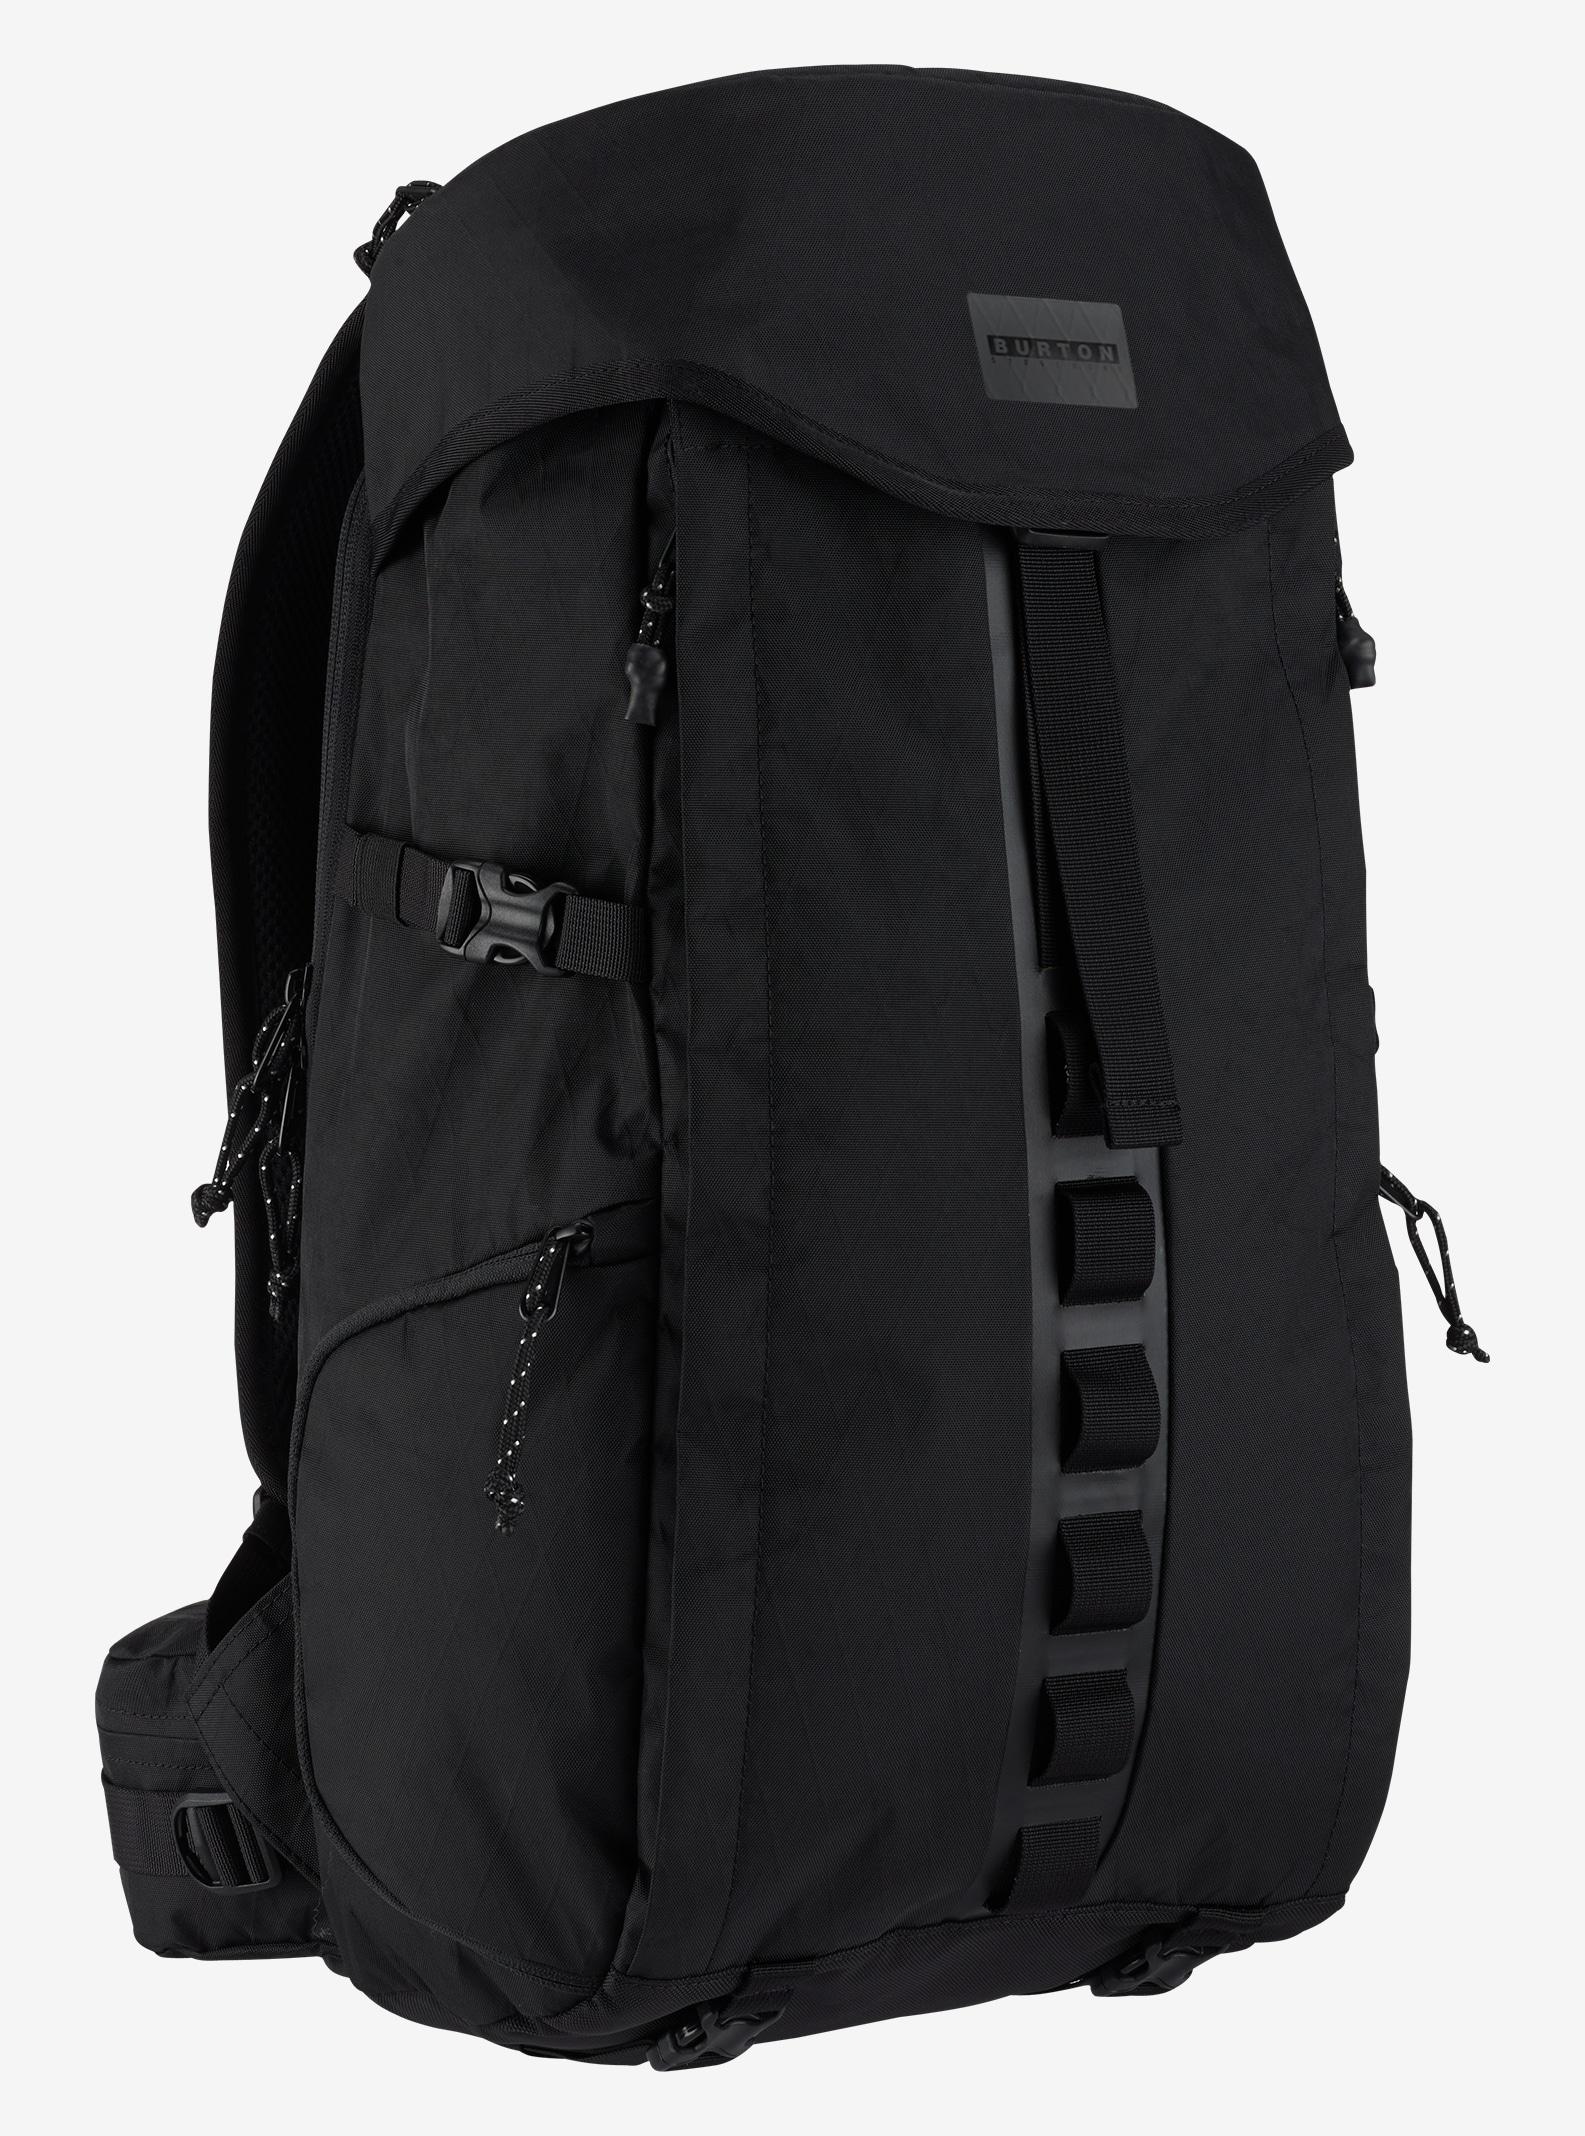 Burton x Aoki Futureproof Backpack shown in Aoki Black